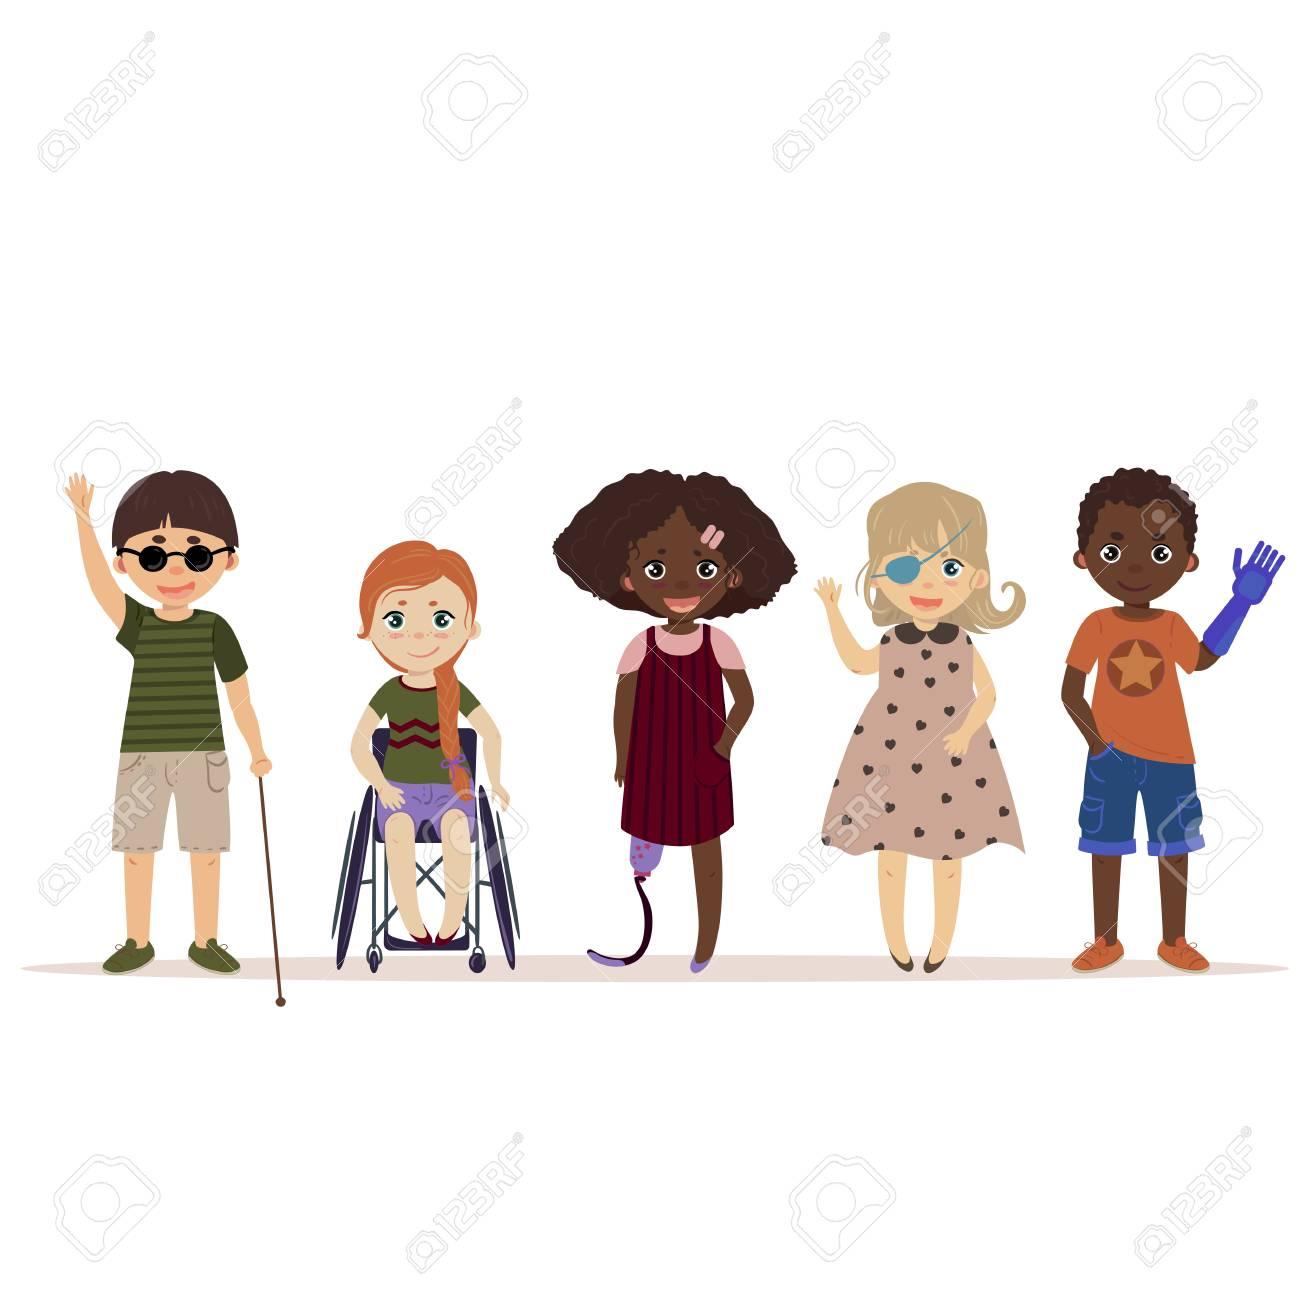 Happy children with disabilities - 89127119